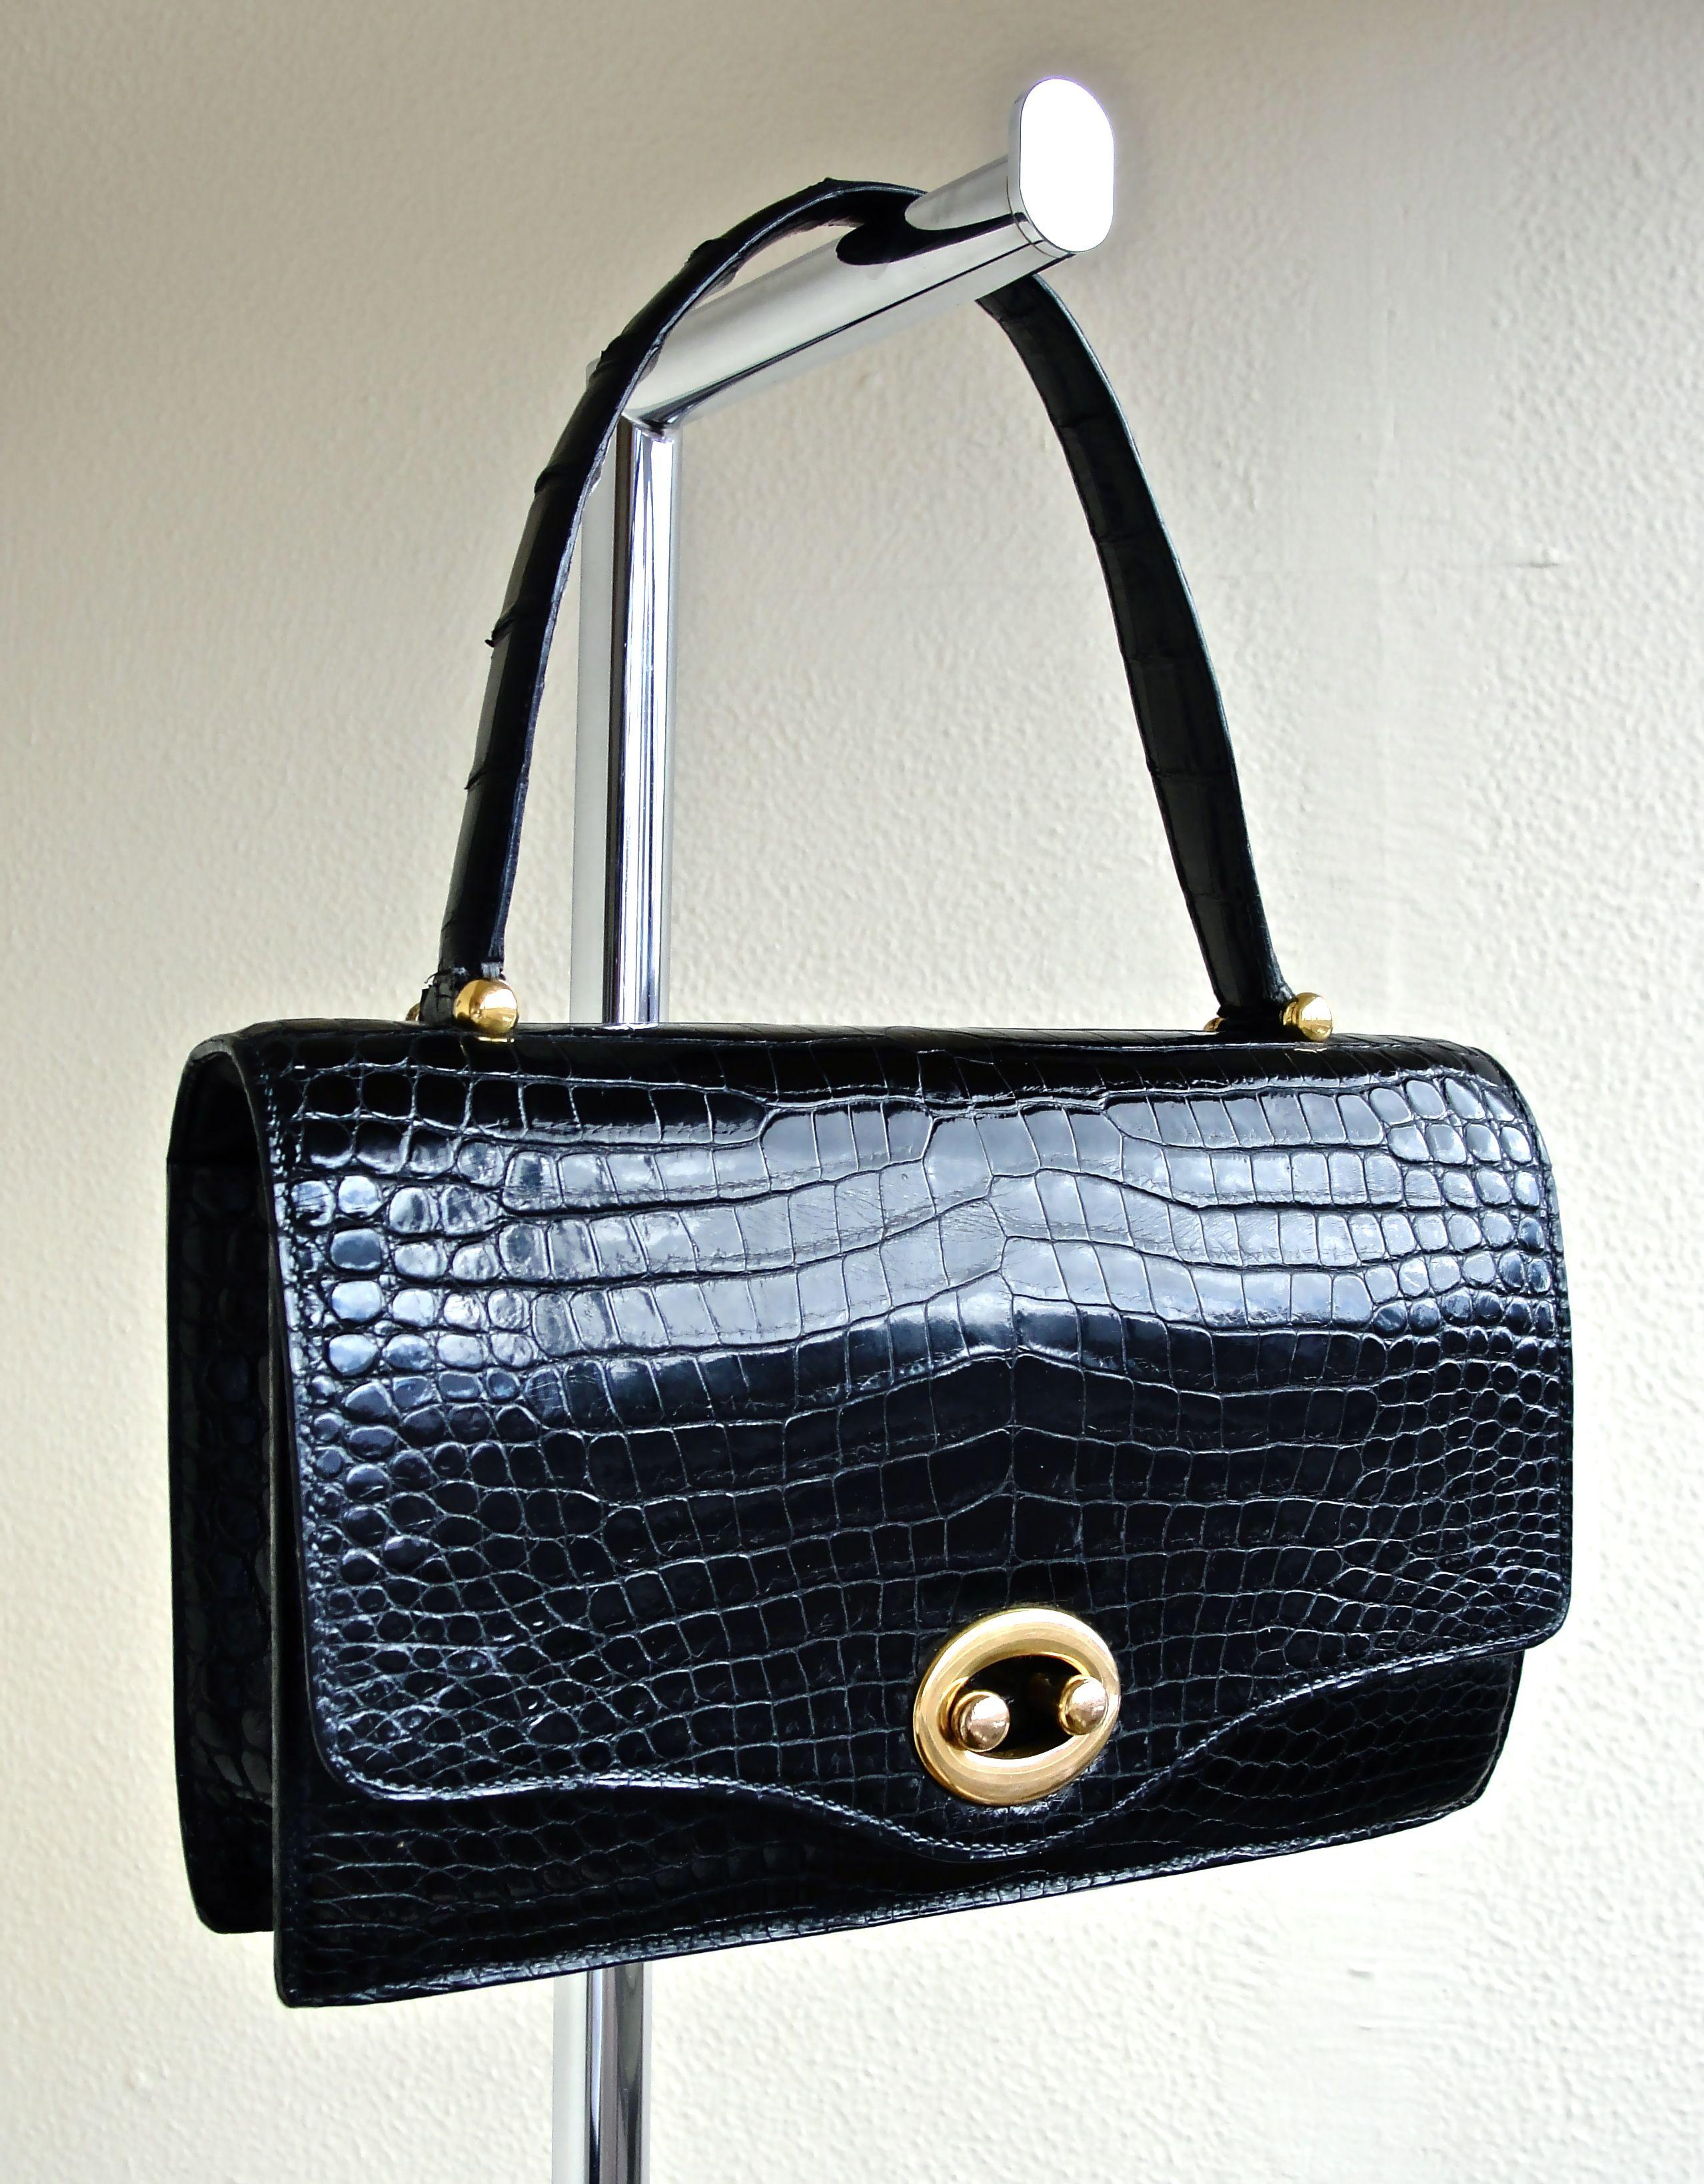 Hermes Handbag VTG era 50´s Clothing and accessories VTG